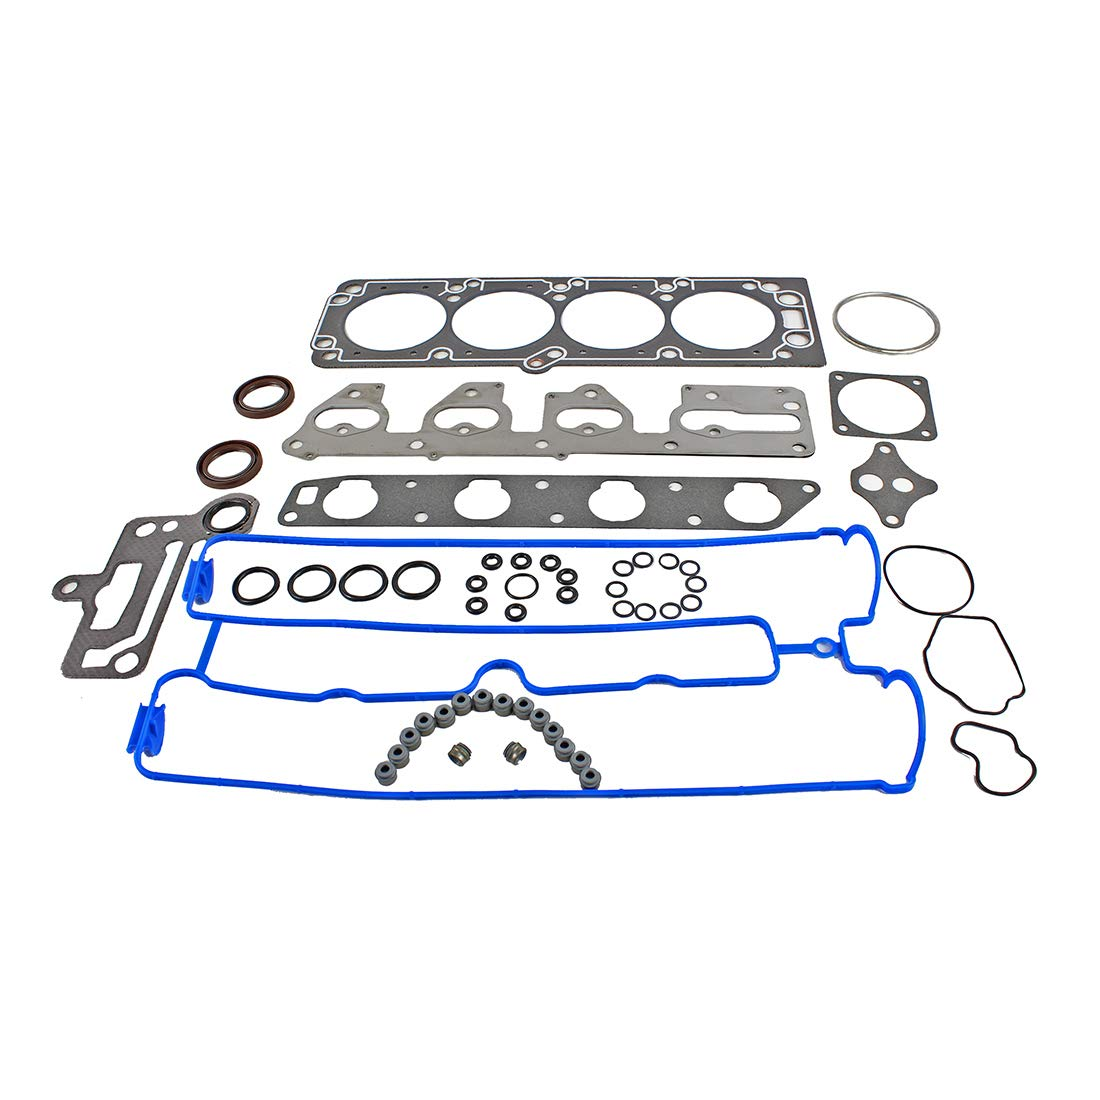 DNJ HGS540 Graphite Head Gasket Set for 2006-2008 // Suzuki//Forenza 2000cc Reno // 2.0L // DOHC // L4 // 16V // 122cid 1998cc